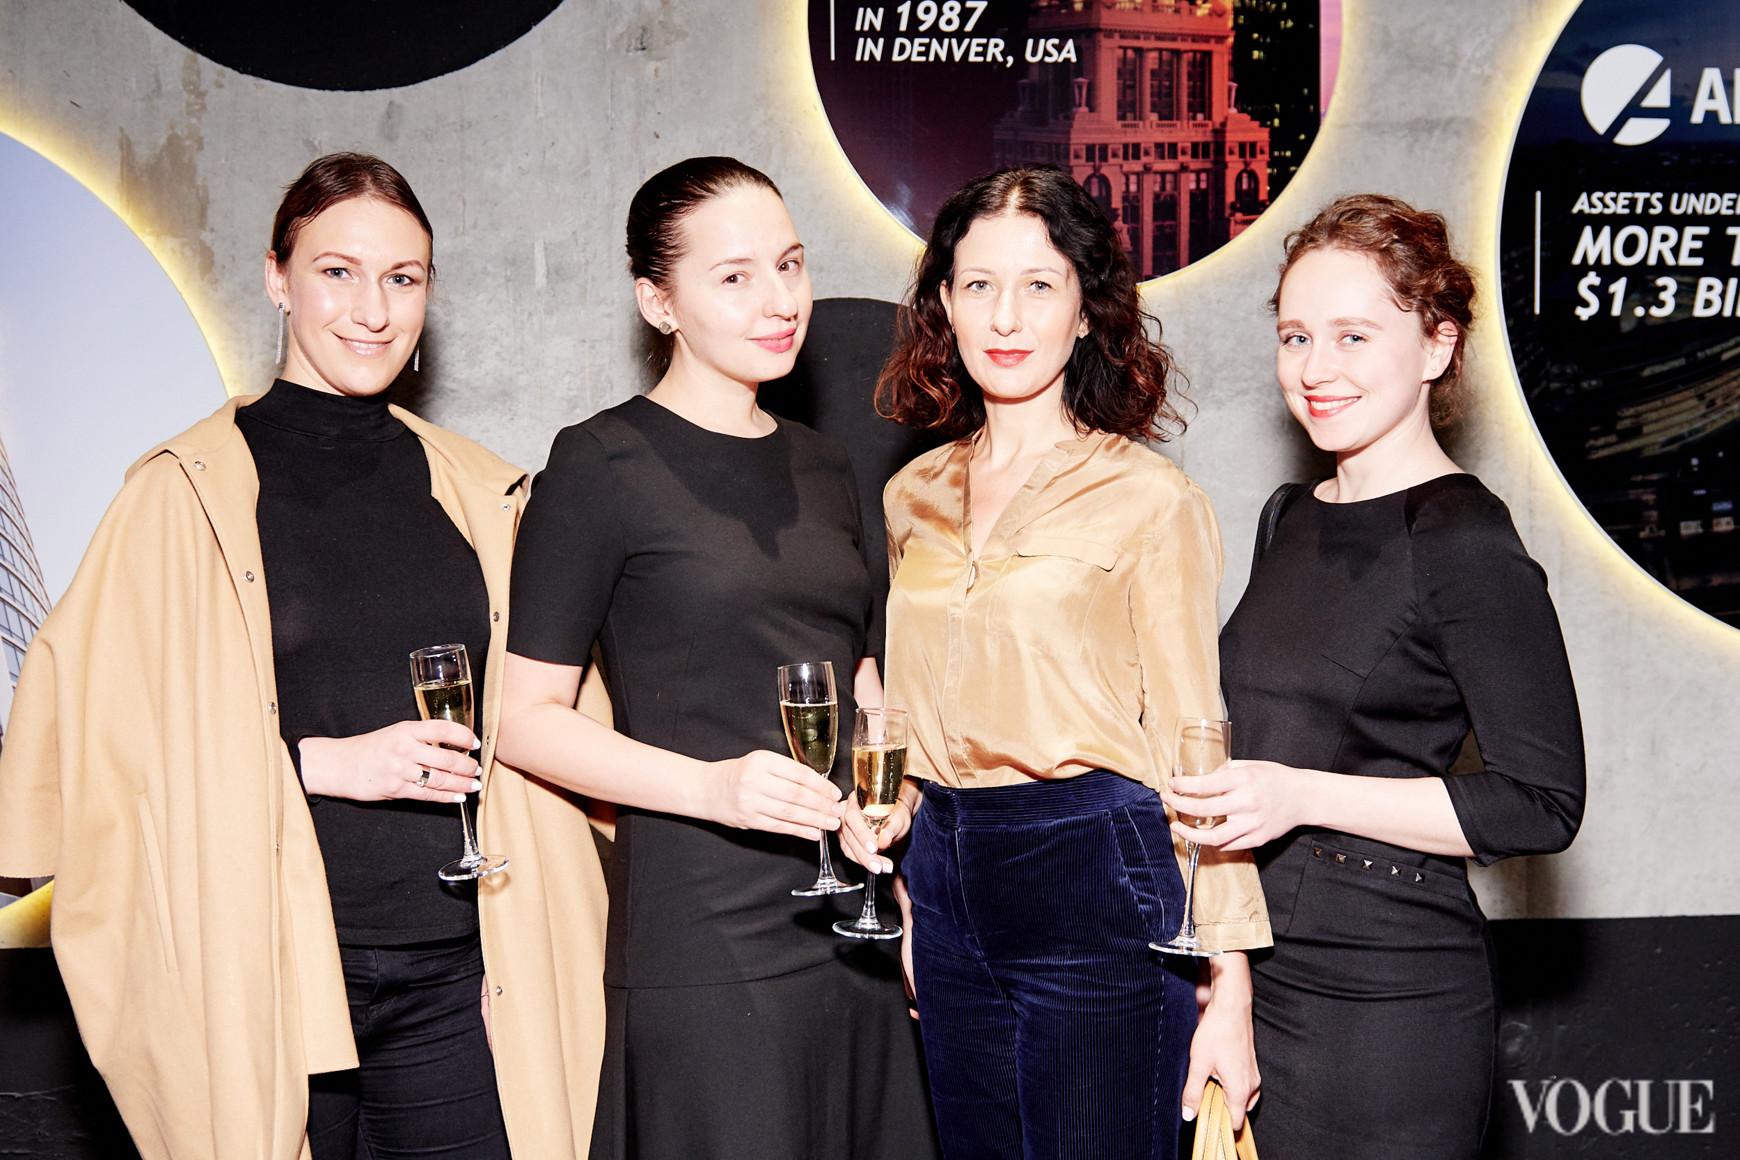 Дарья Слободяник, Виолетта Федорова, Светлана Рощук и Ирина Володько